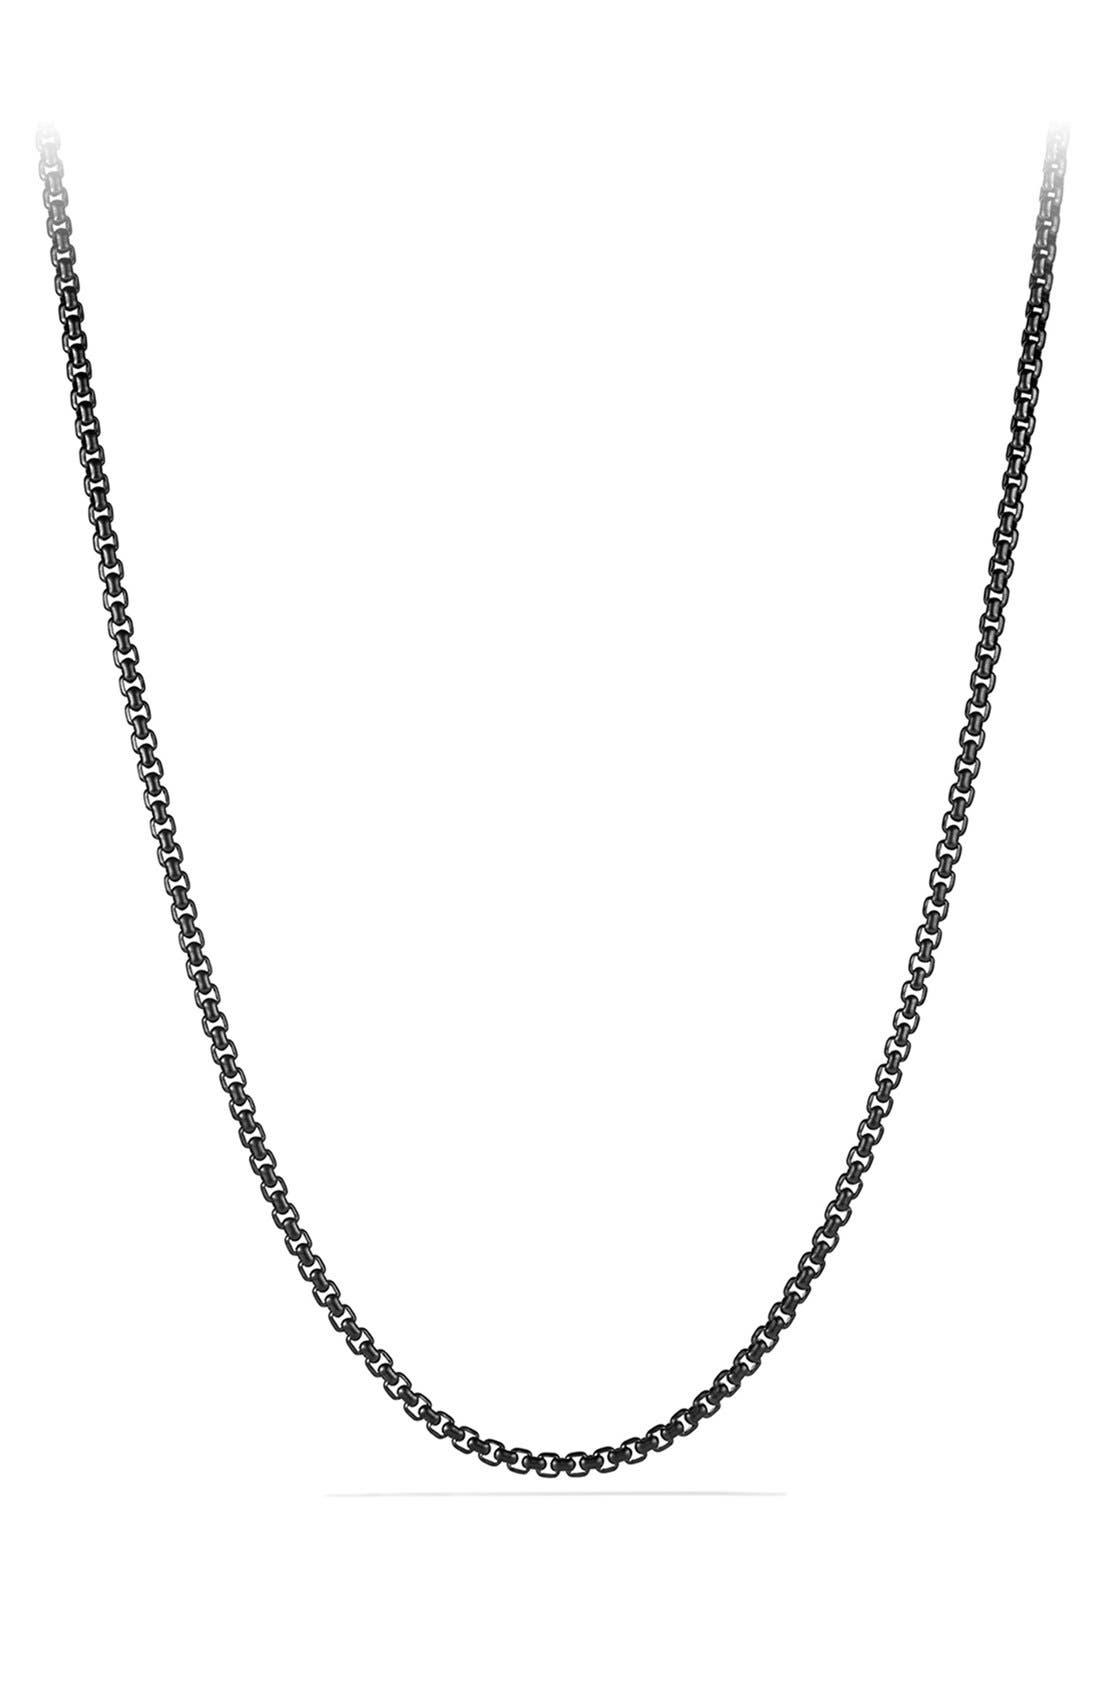 Alternate Image 1 Selected - David Yurman 'Chain' Box Chain Necklace